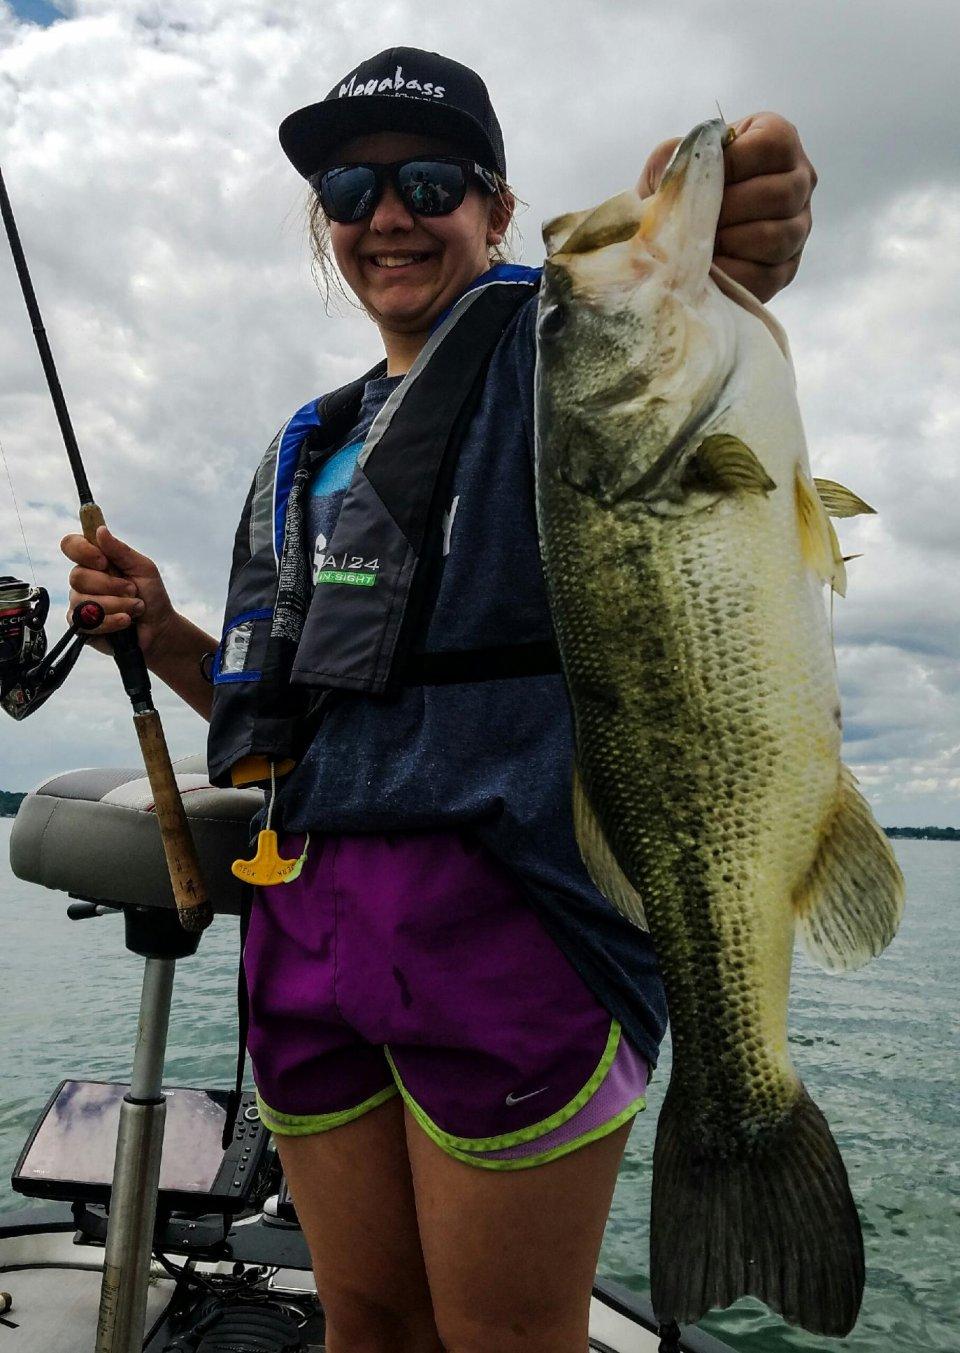 13 year old Lauren Bentz's catch Saturday on Cayuga lake near Aurora. Photo by Laura Bentz